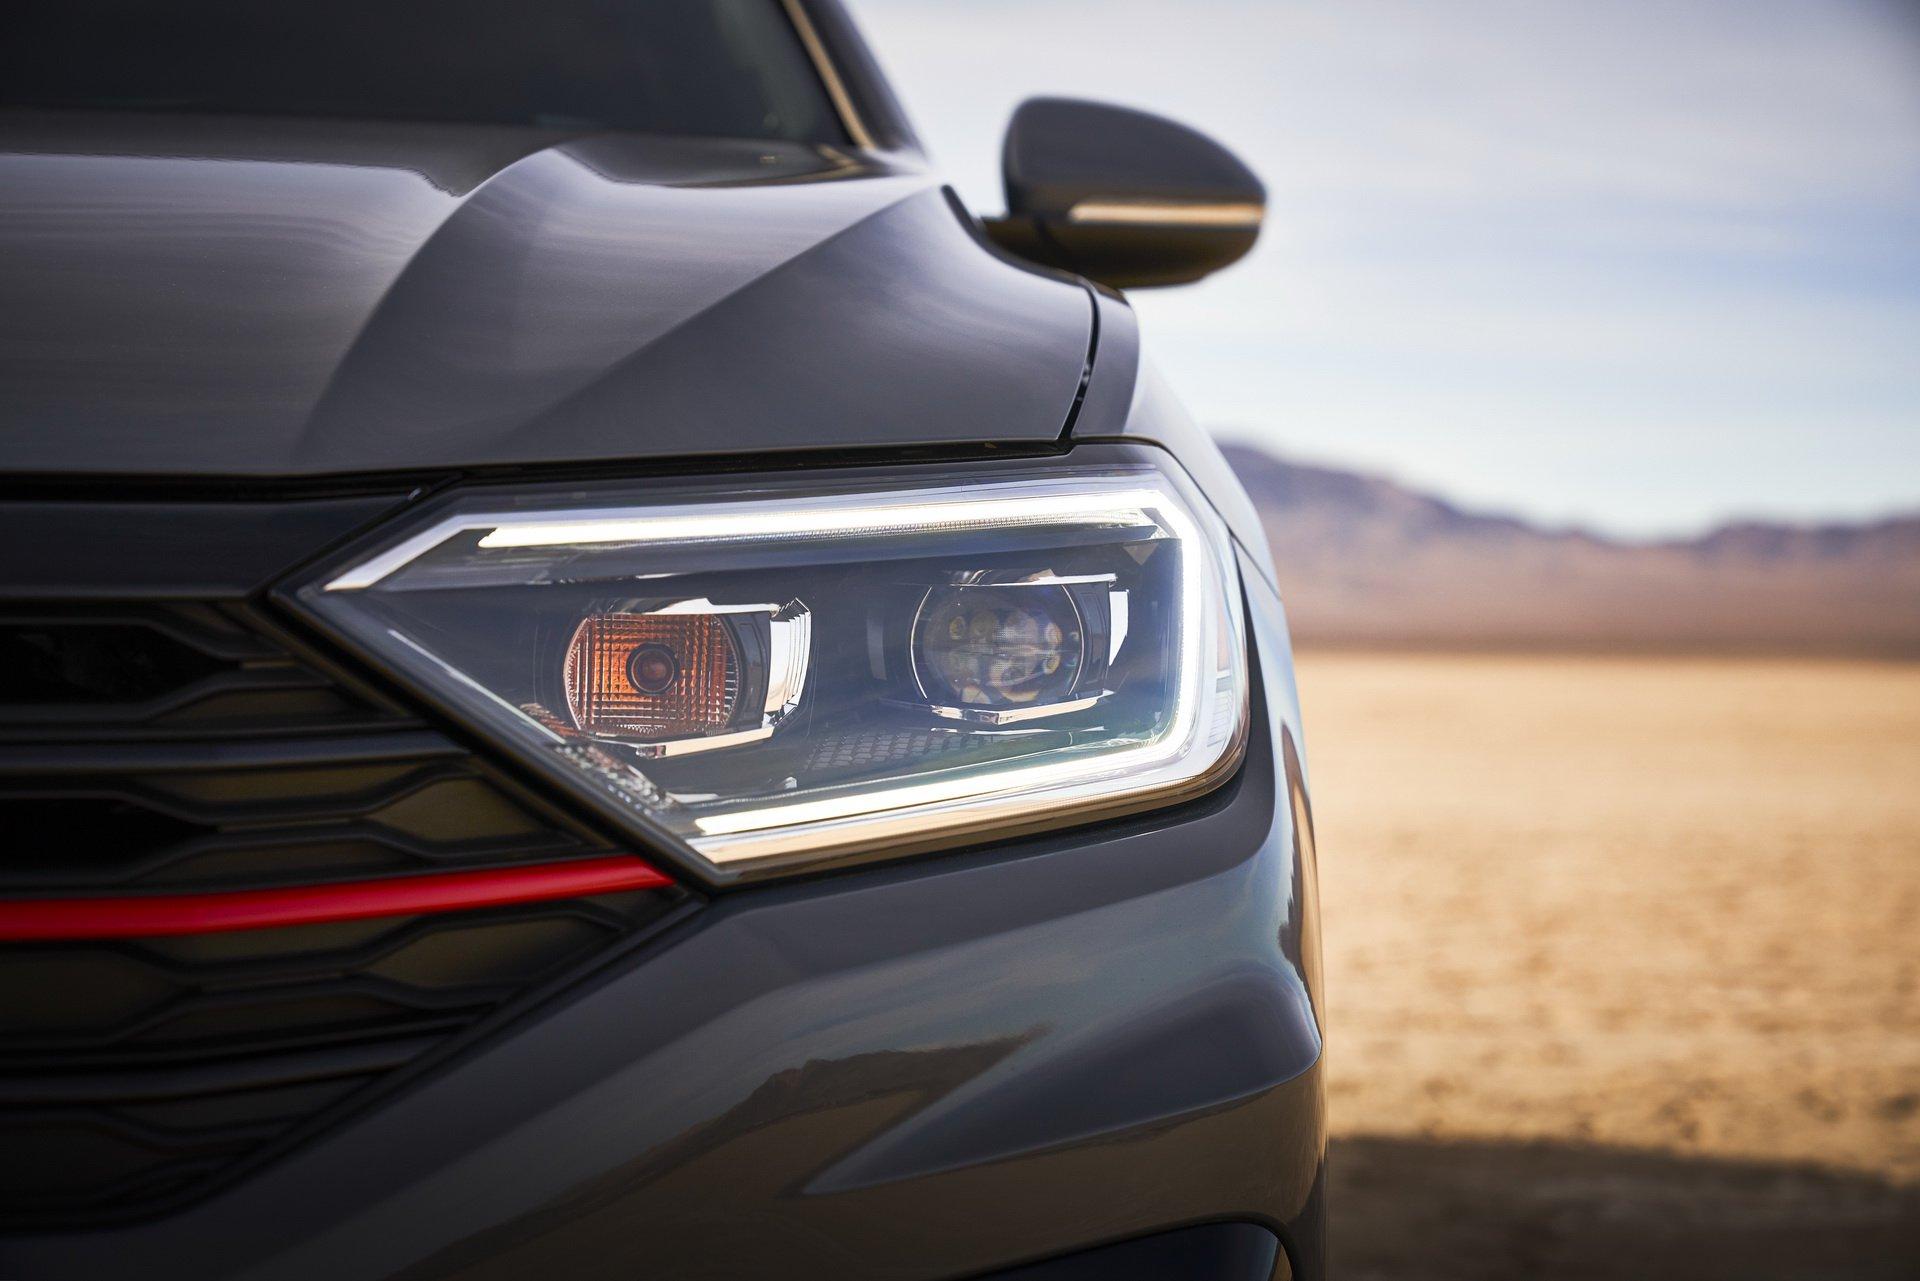 2019 Volkswagen Jetta GLI Headlight Wallpaper (15)